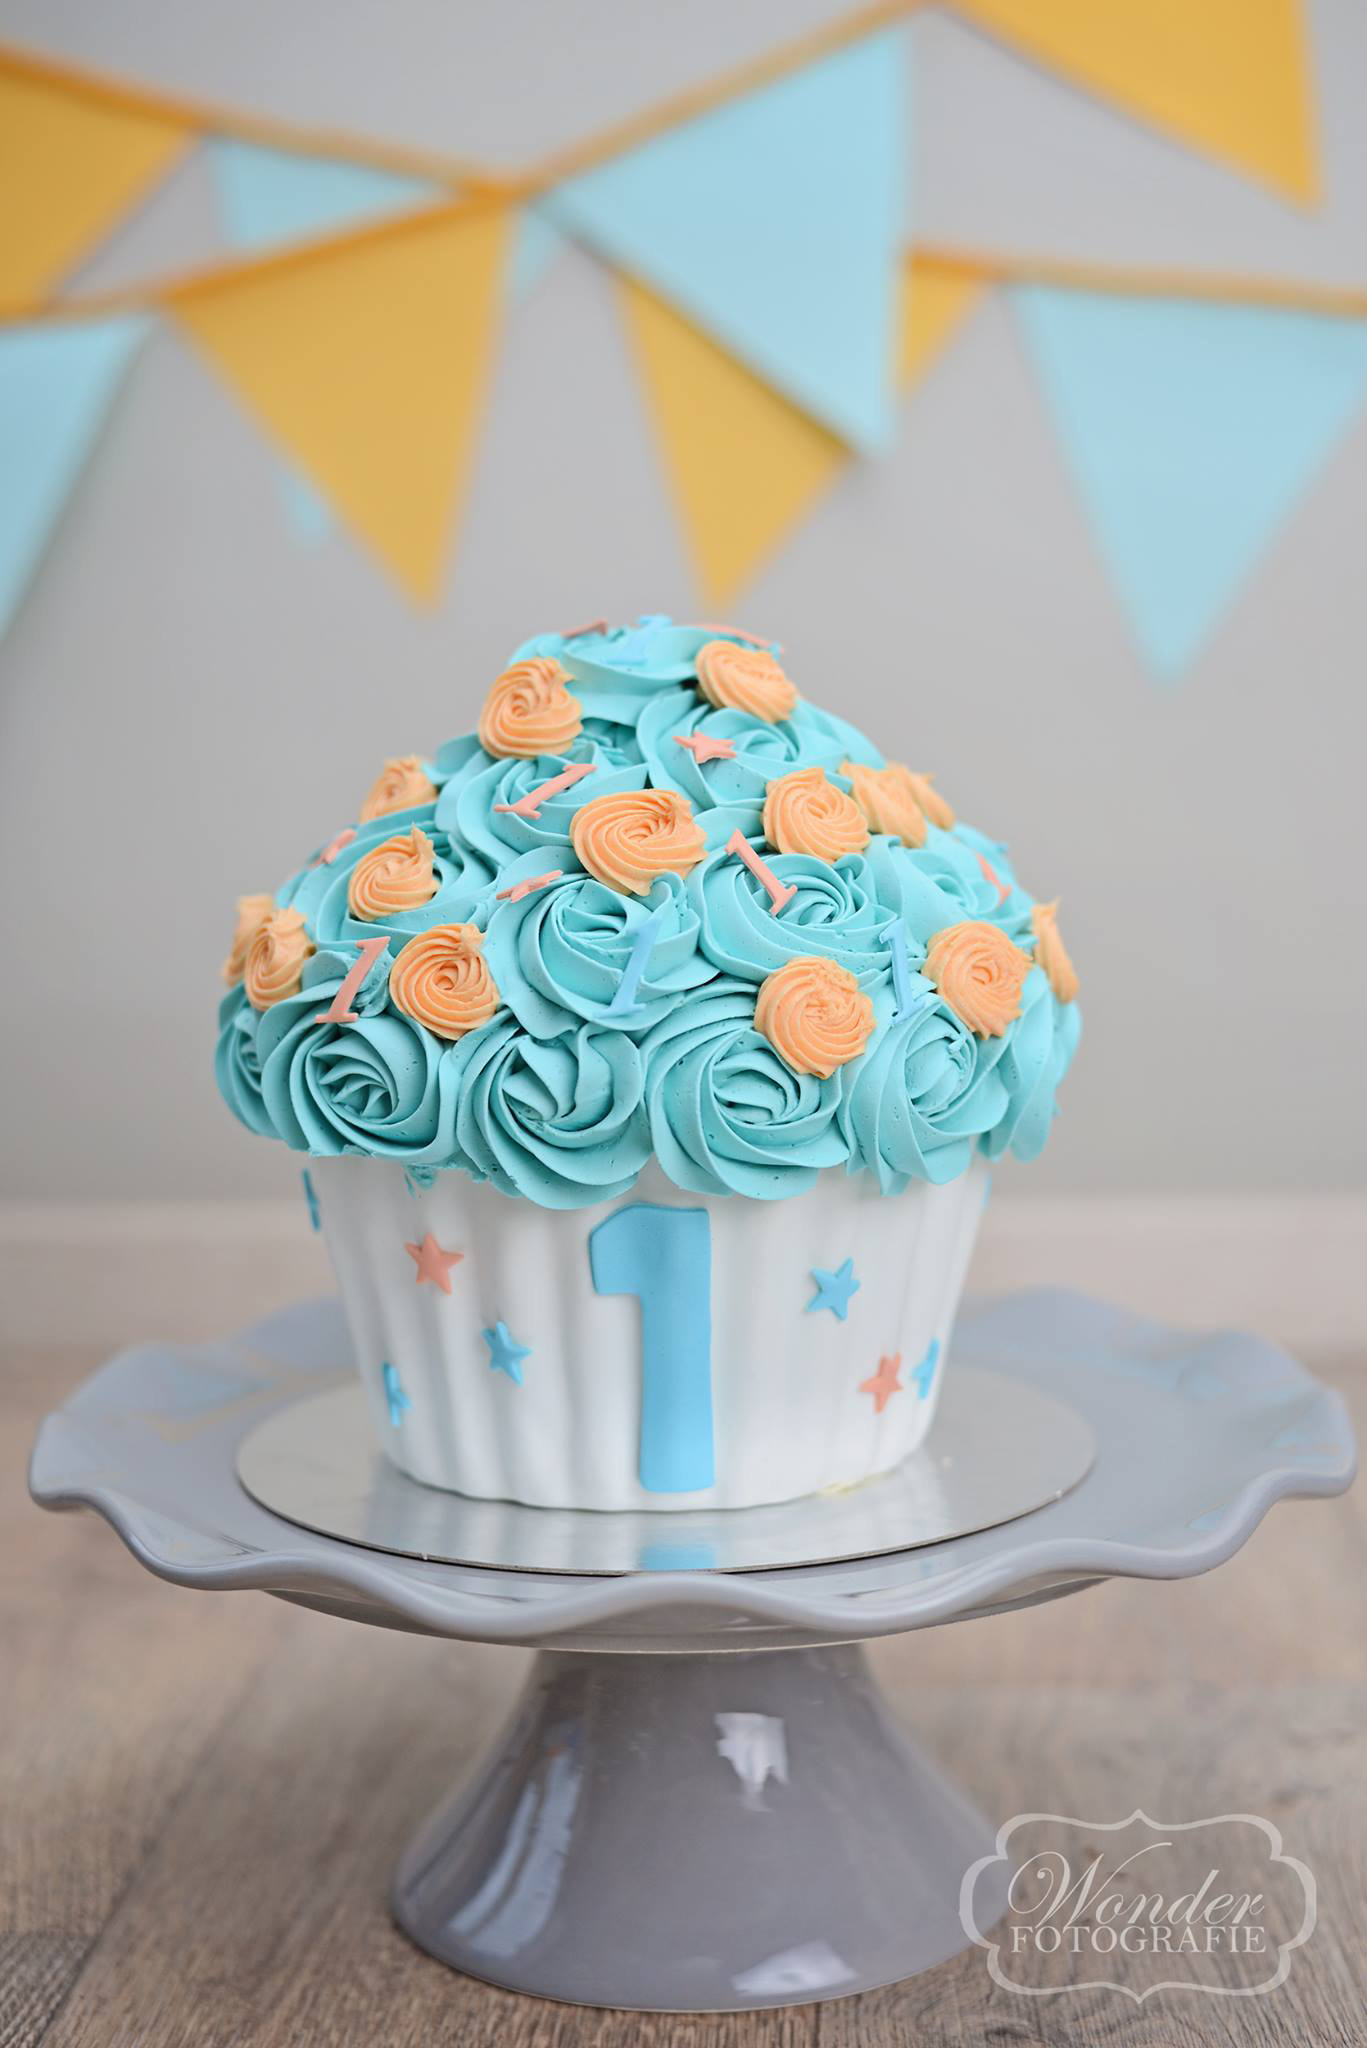 Cake Smash BlauwOranje - Wonder Fotografie